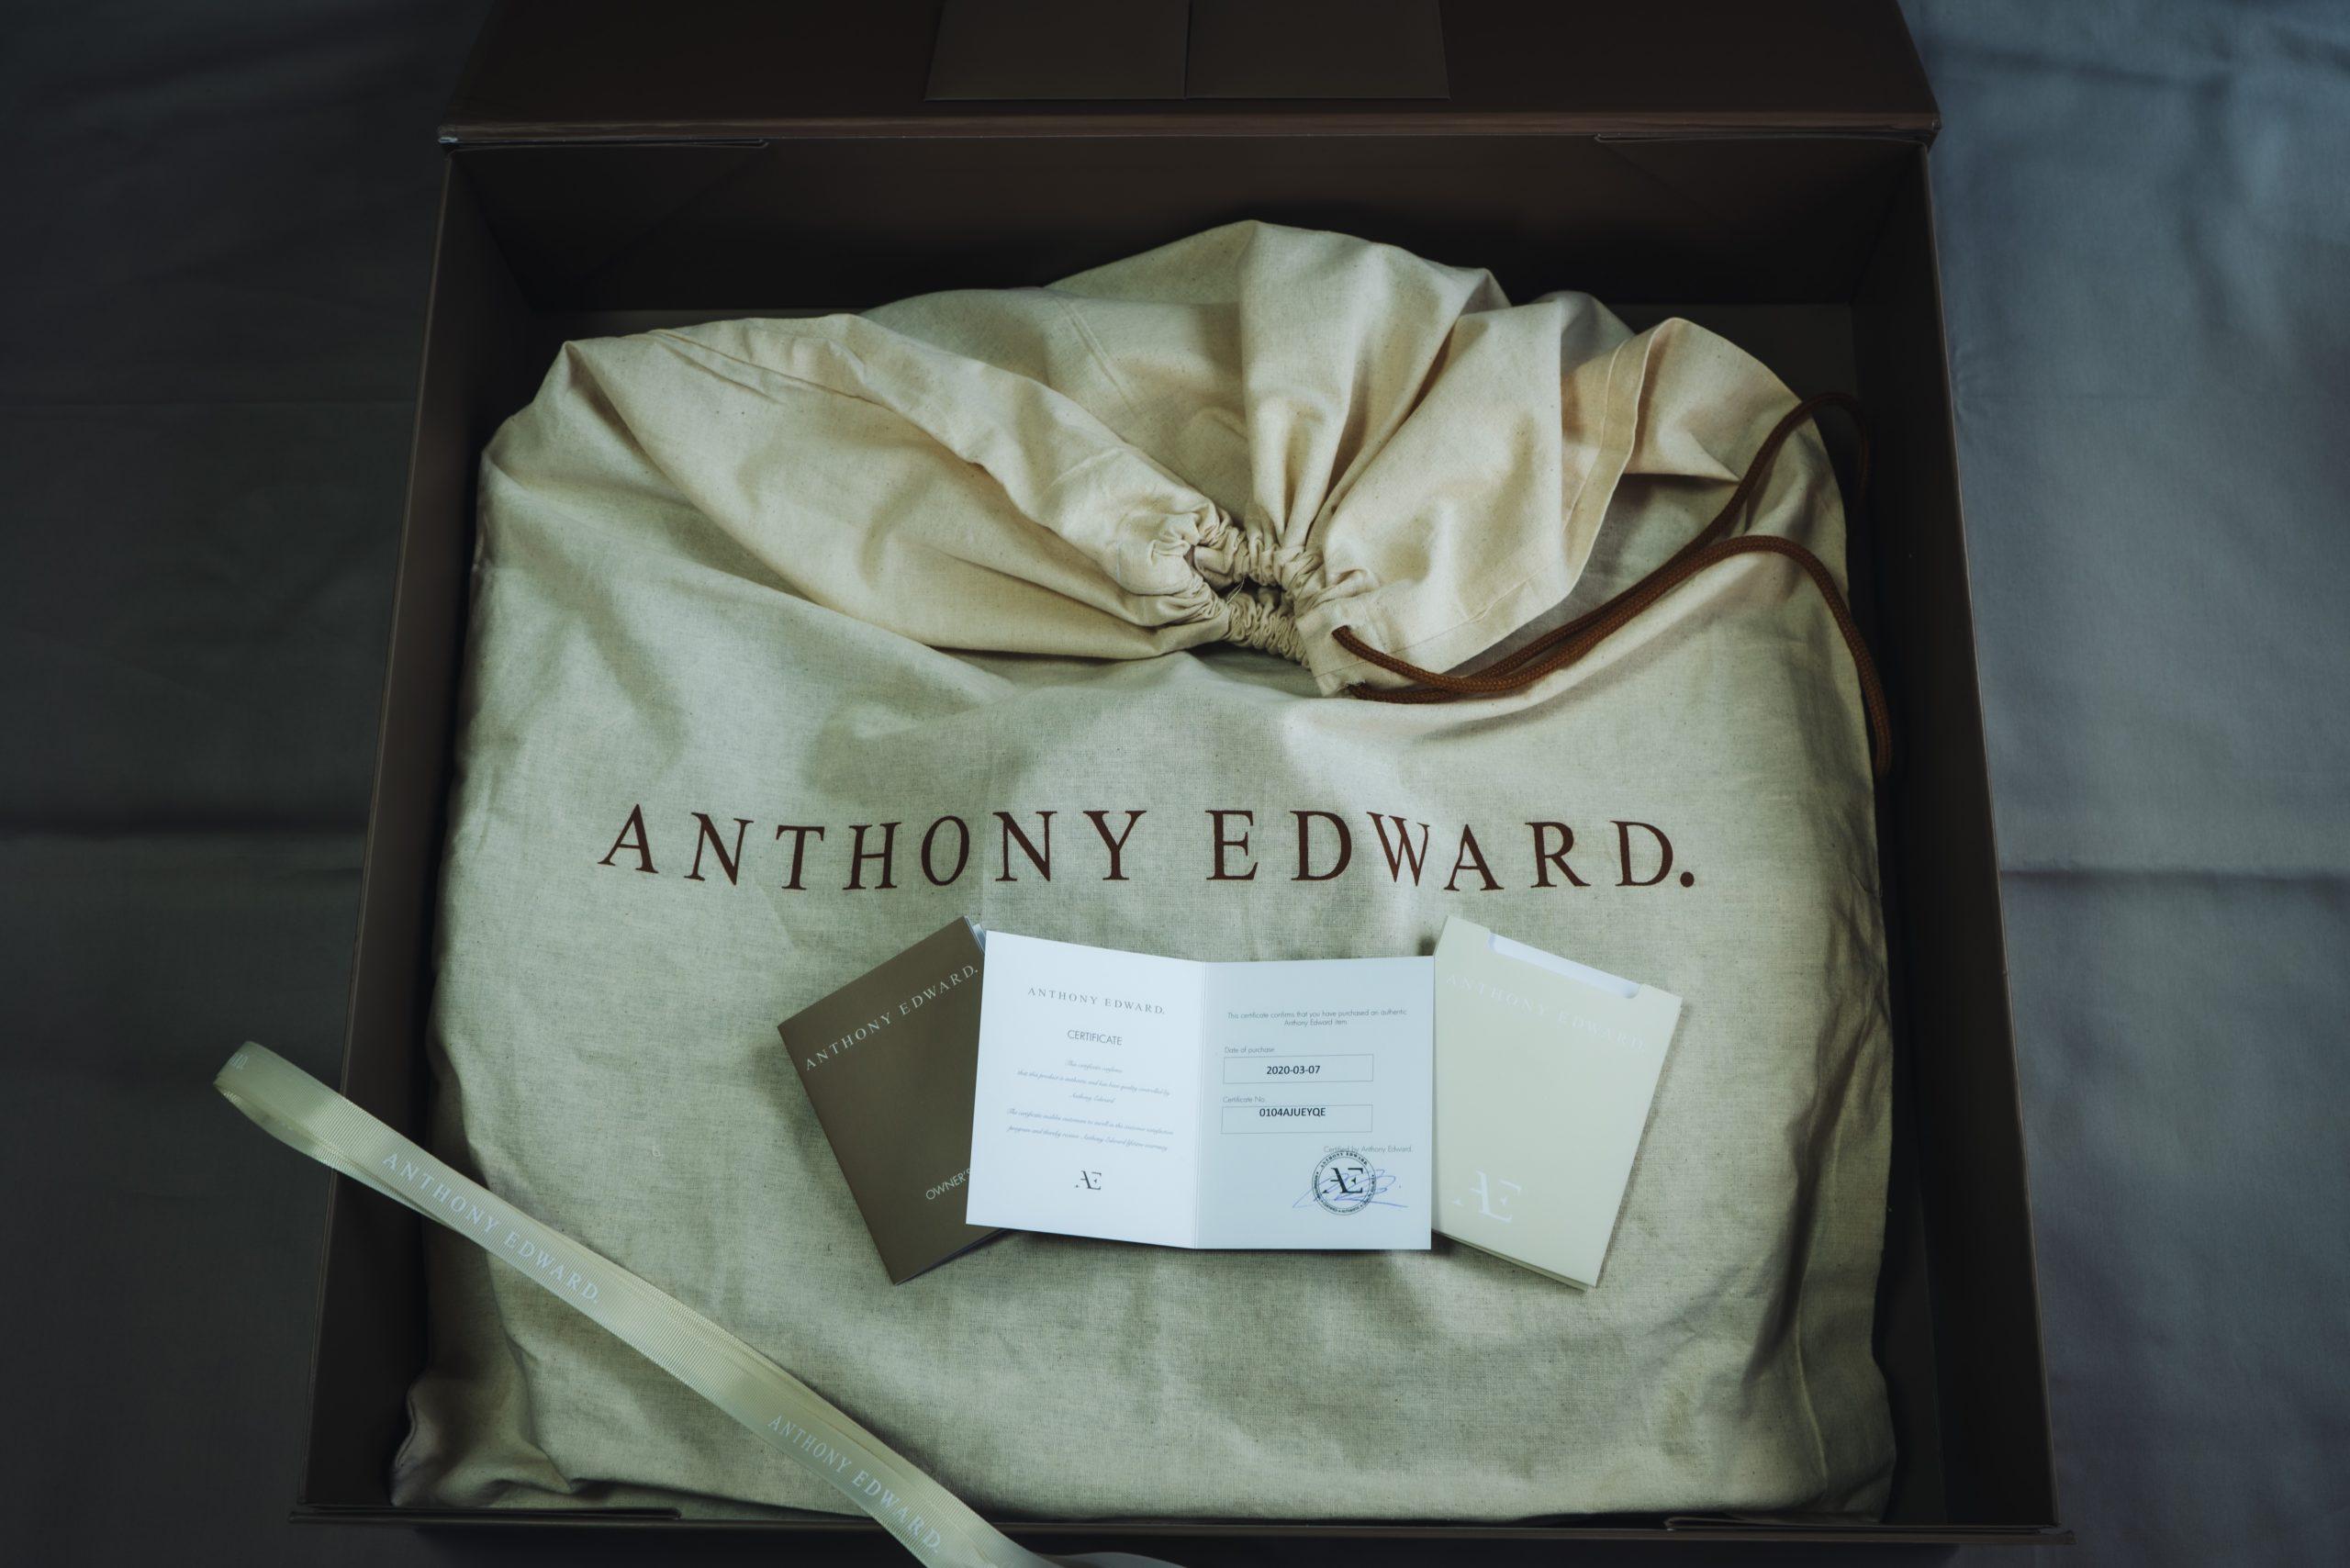 ANTHONY EDWARD ダッフルバッグを開封